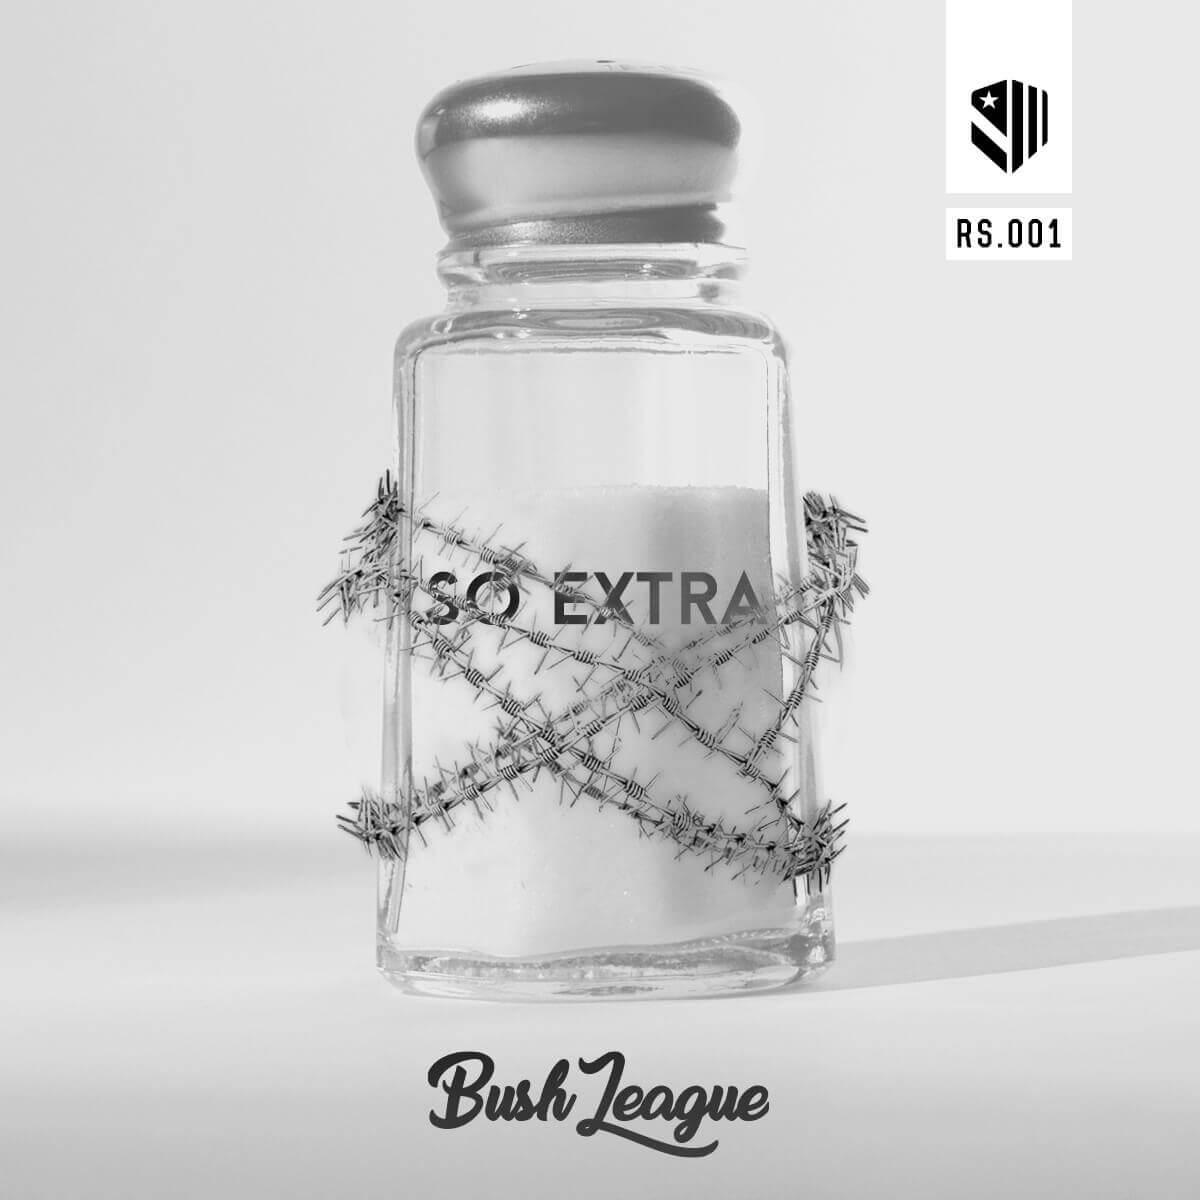 Bush League So Extra